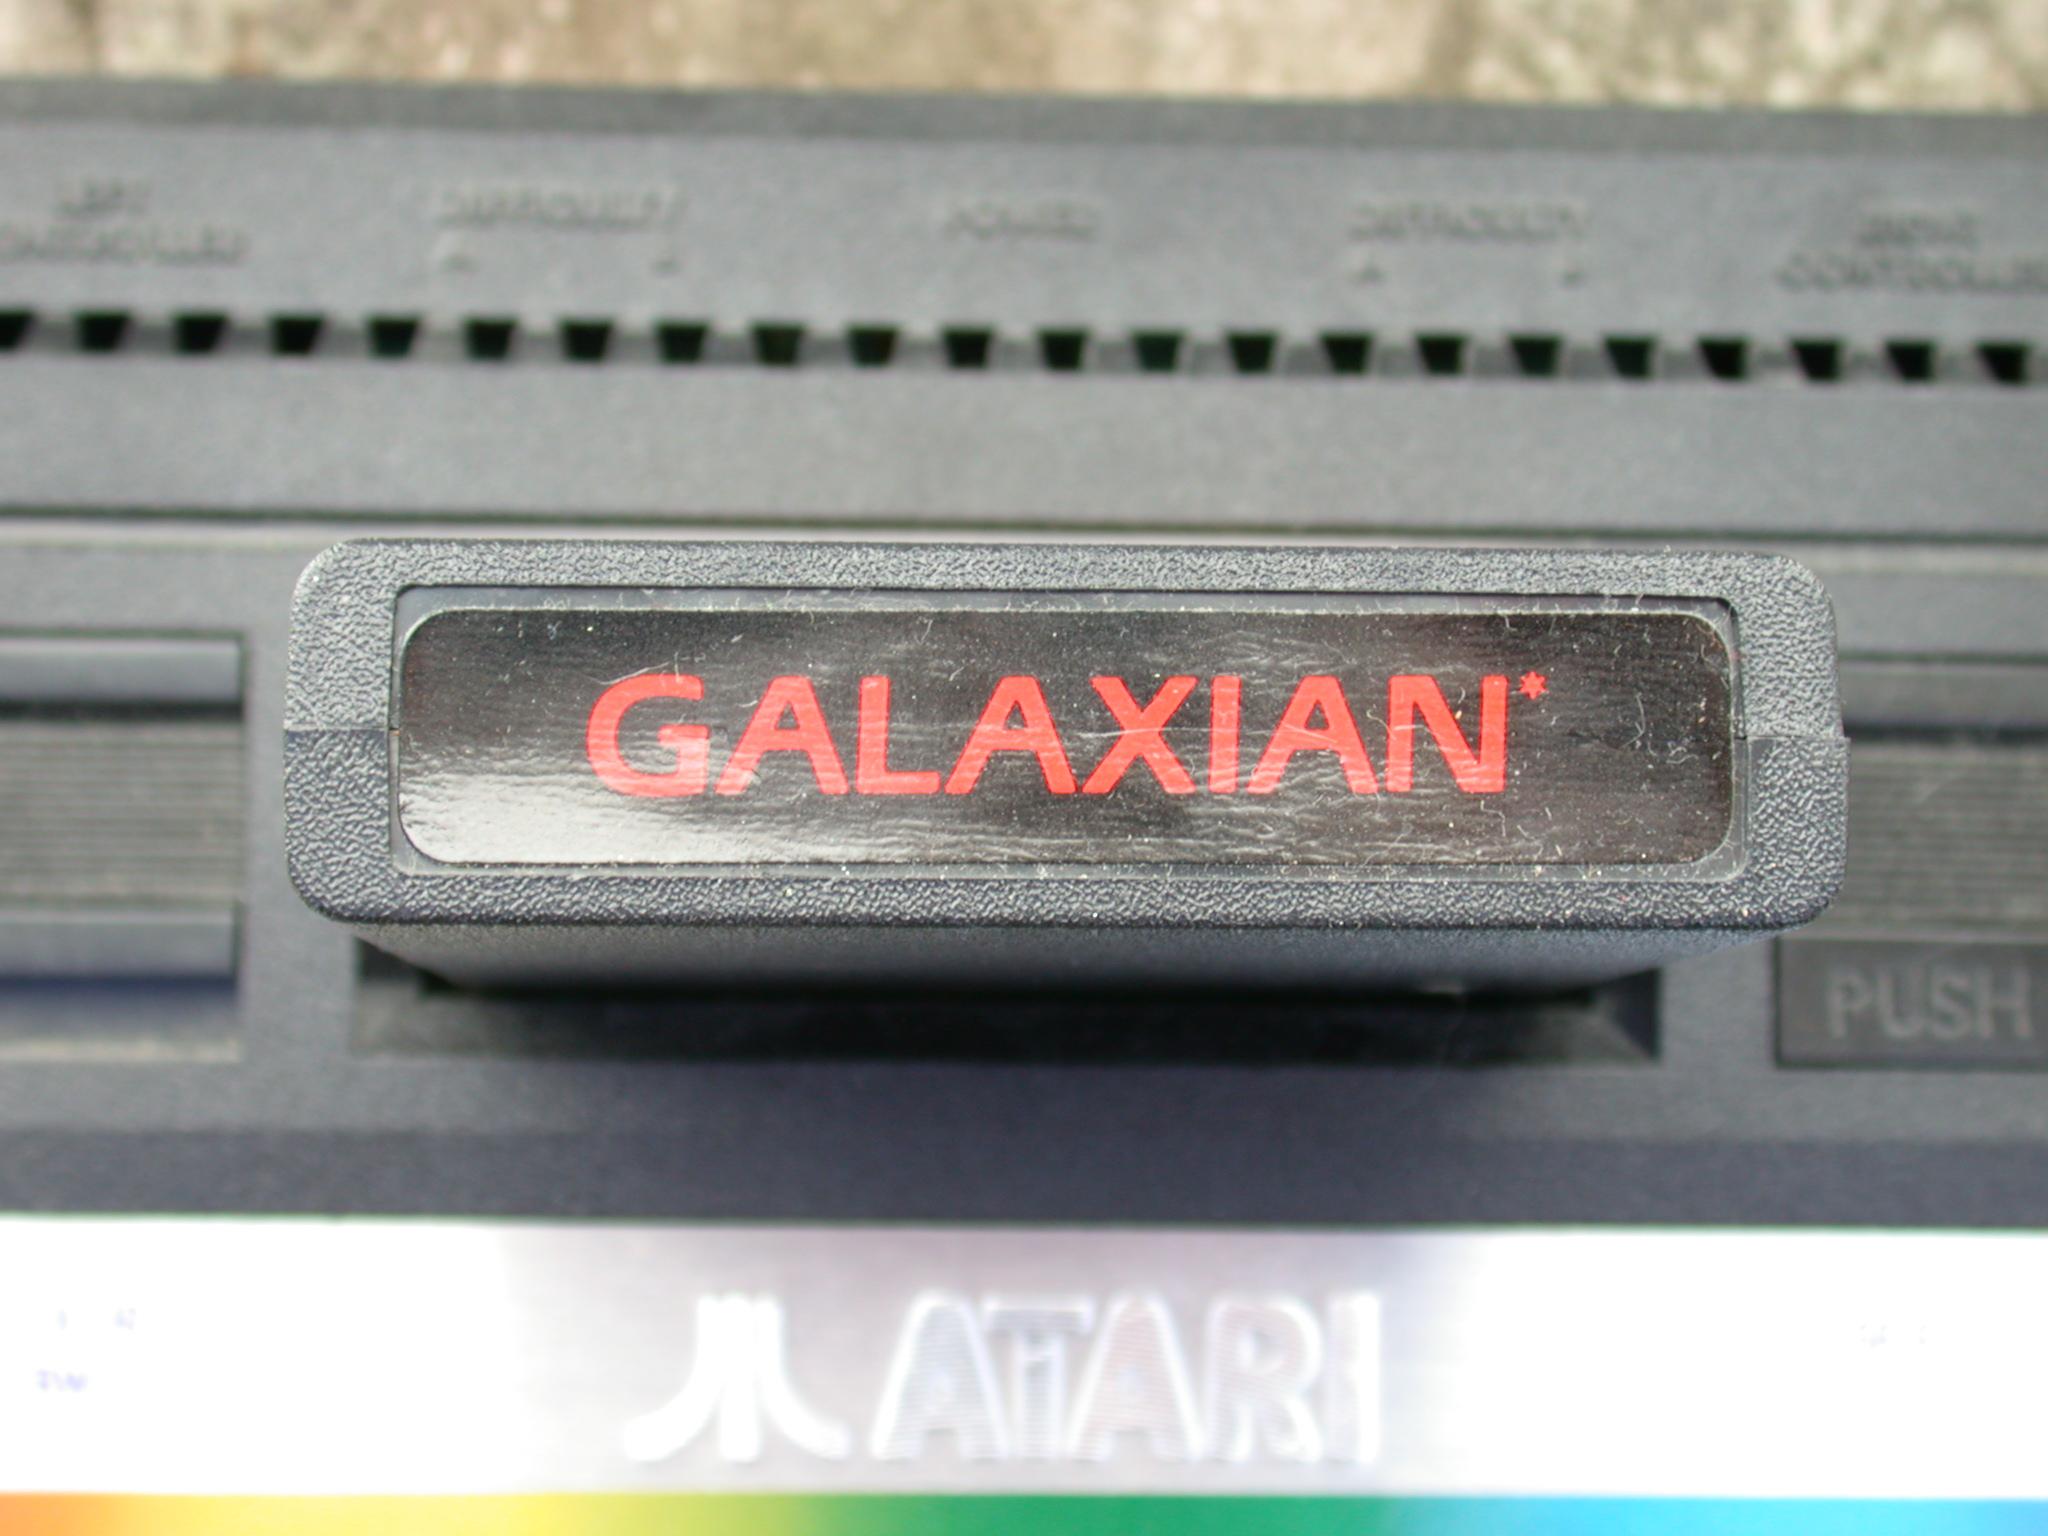 galaxian game cardrige atari console